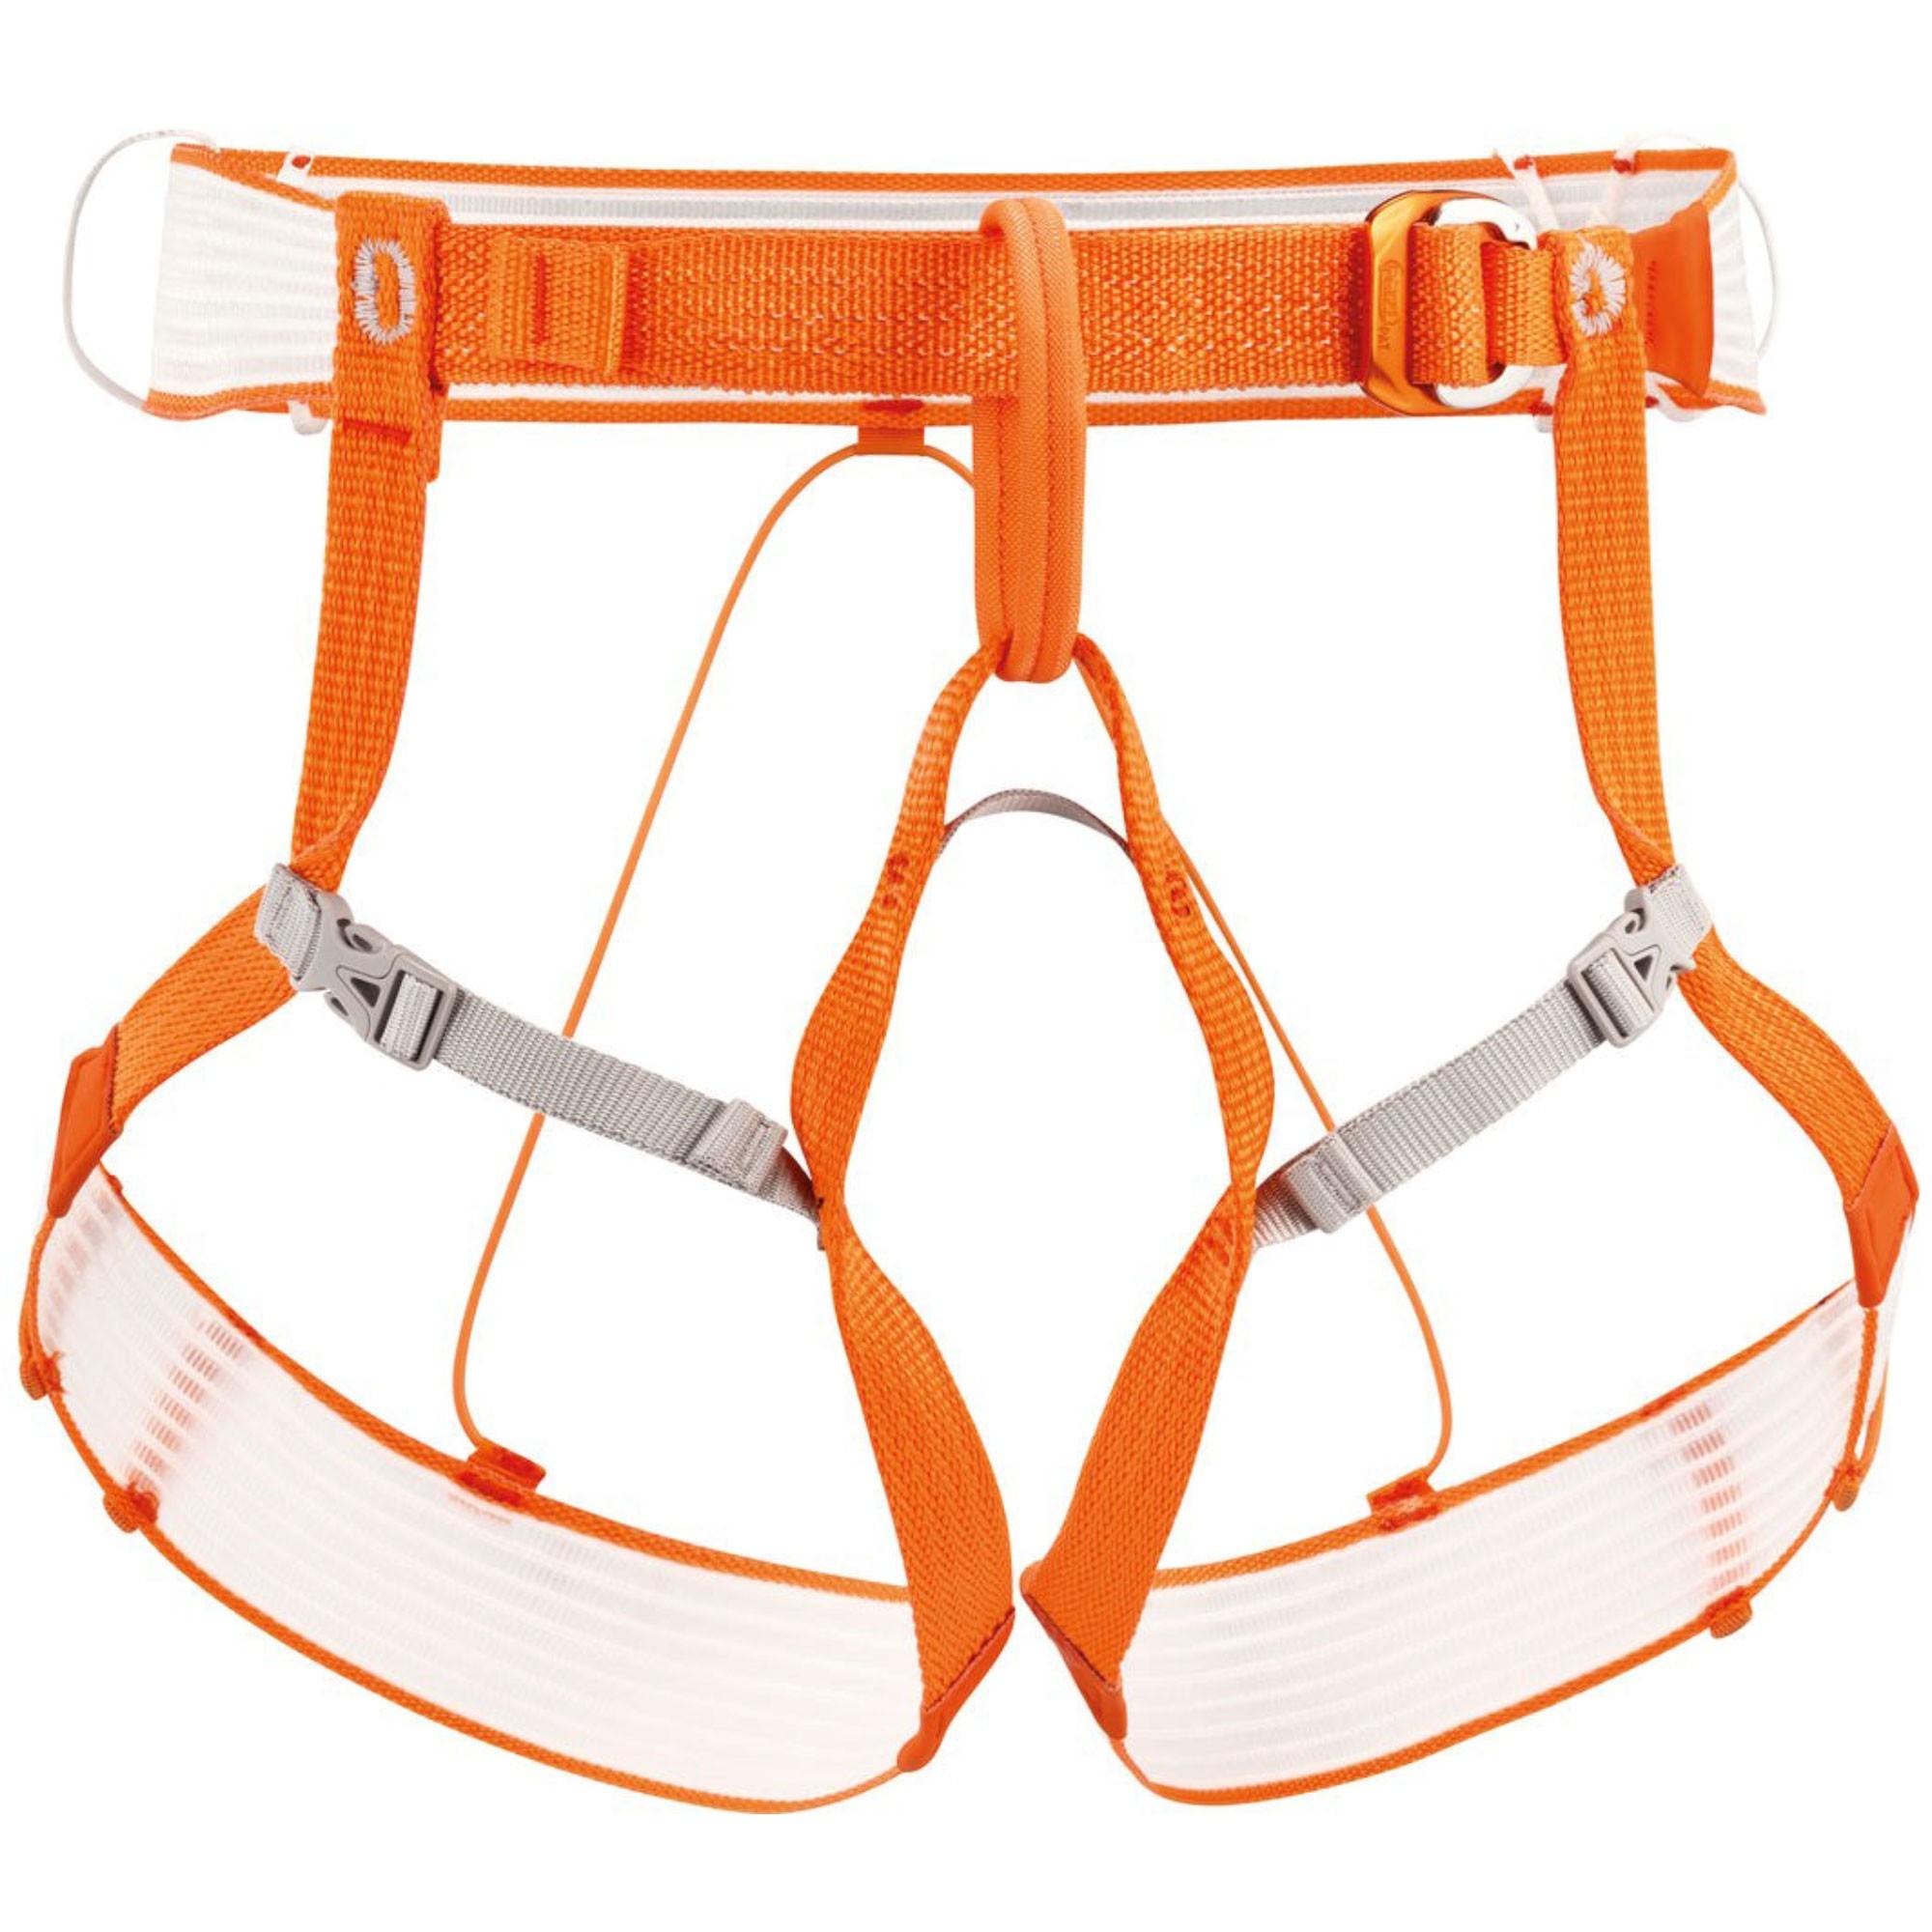 Petzl Altitude Mountaineering Harness Orange/White